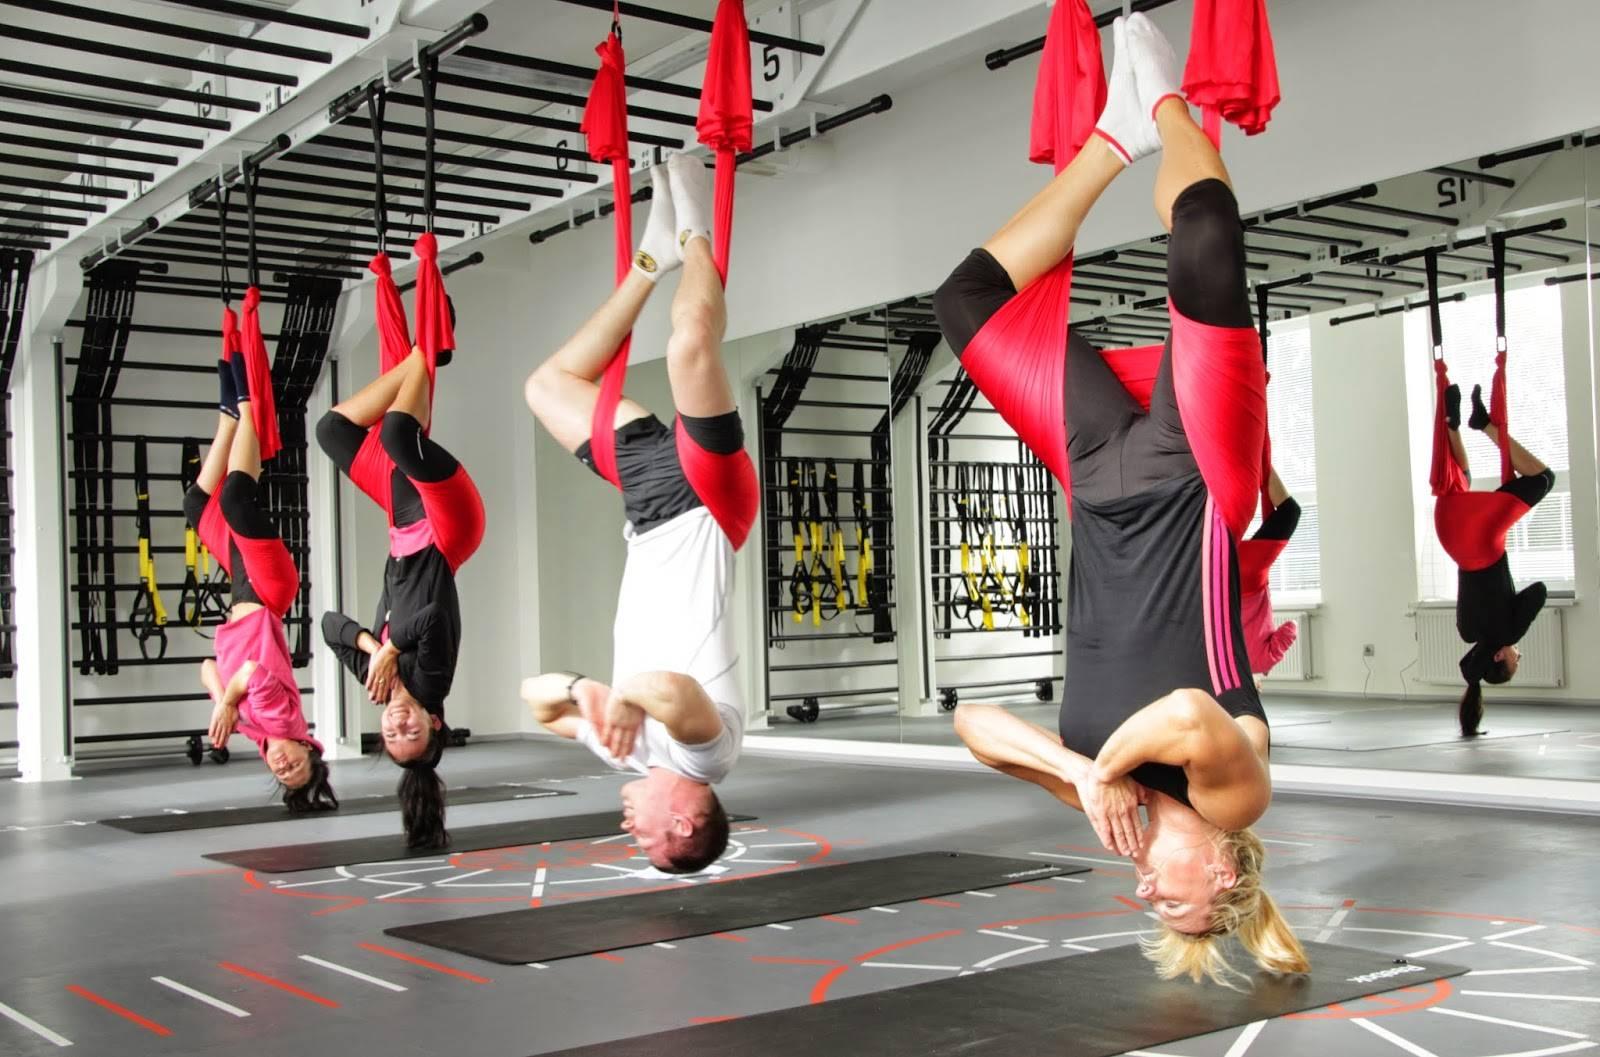 Антигравити-йога: новый вид фитнеса